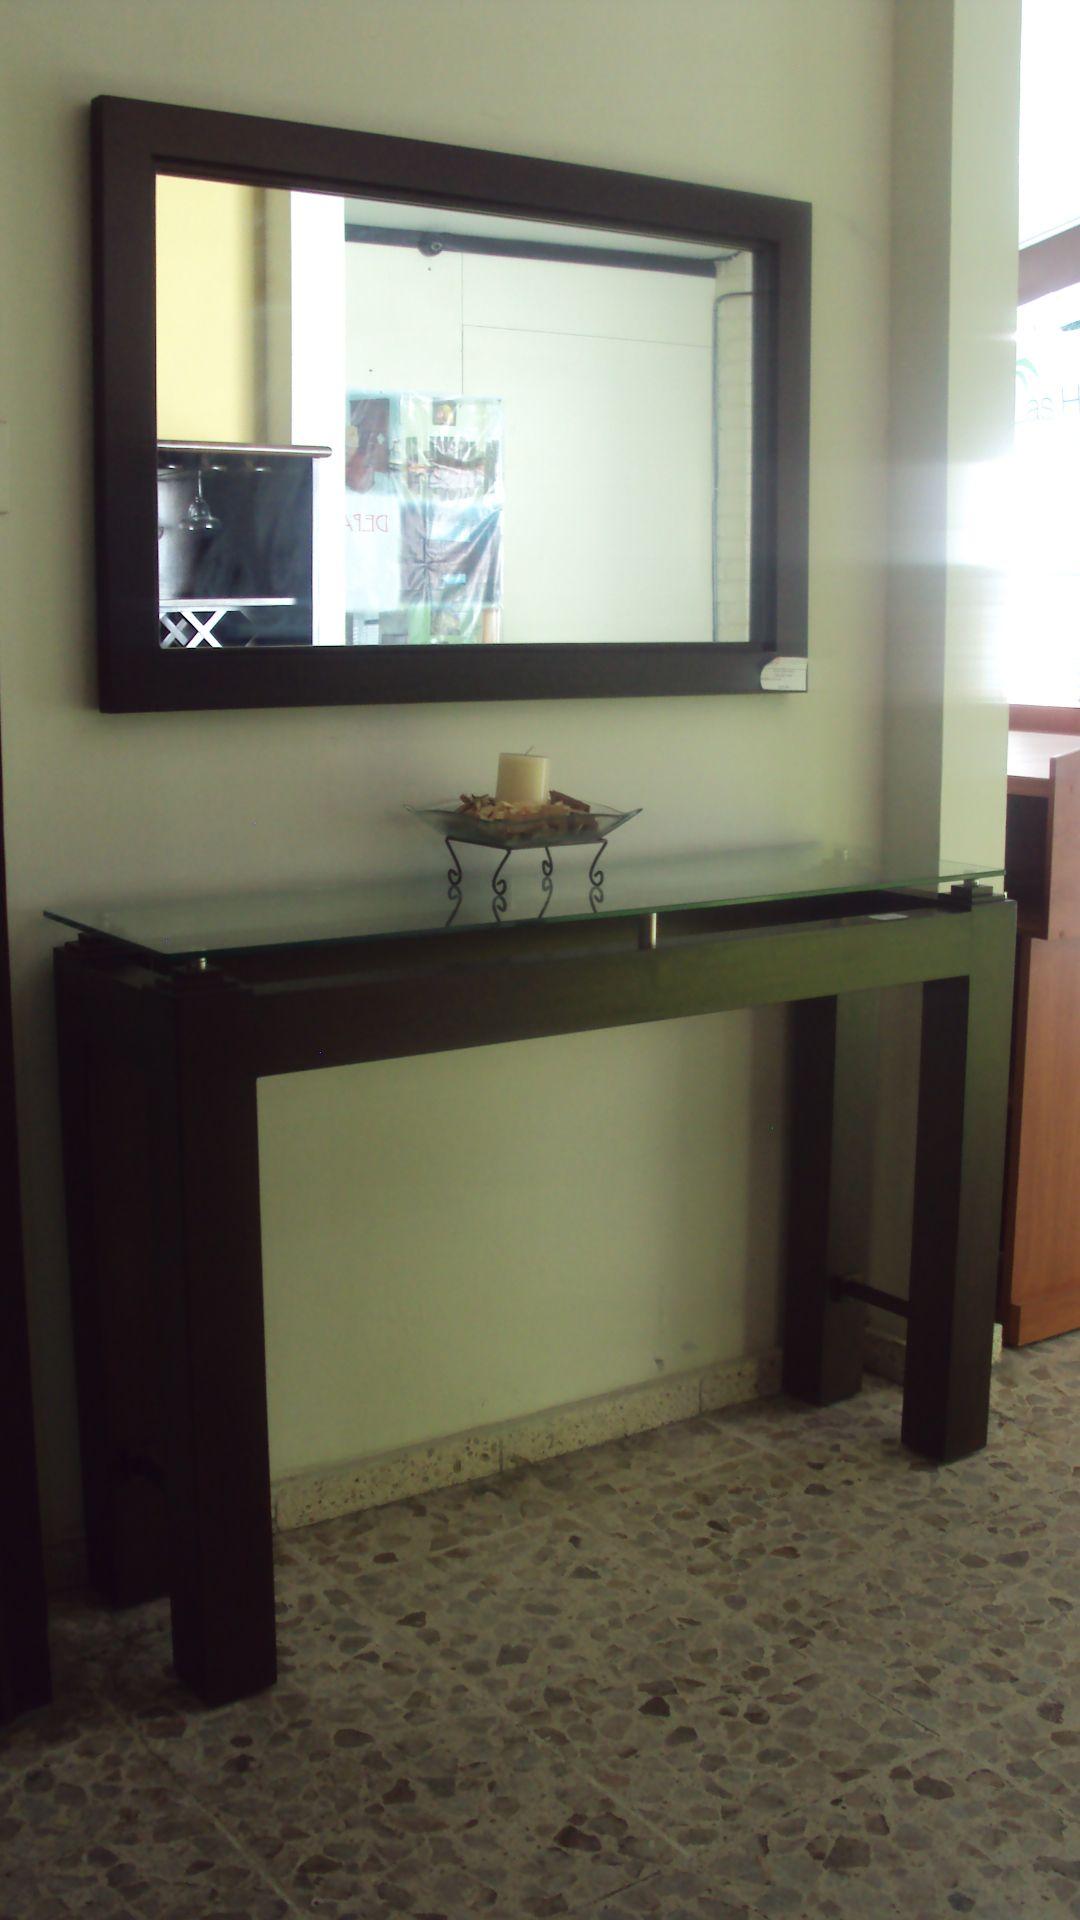 Bufetera fabricada con madera de cedro accesorios de